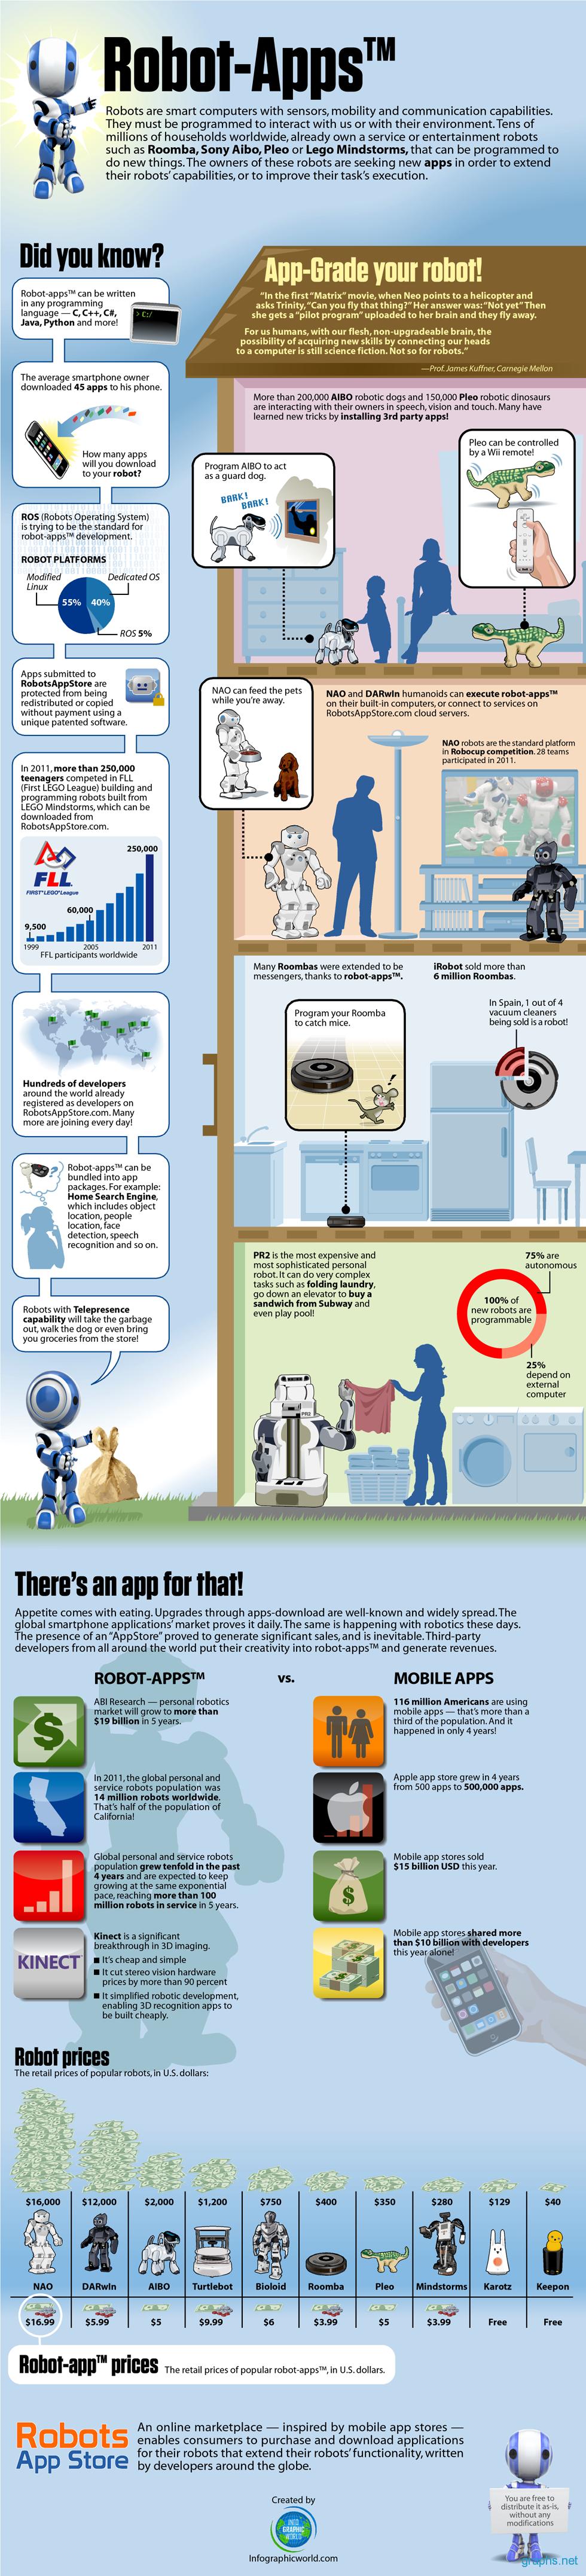 Robot Applications information